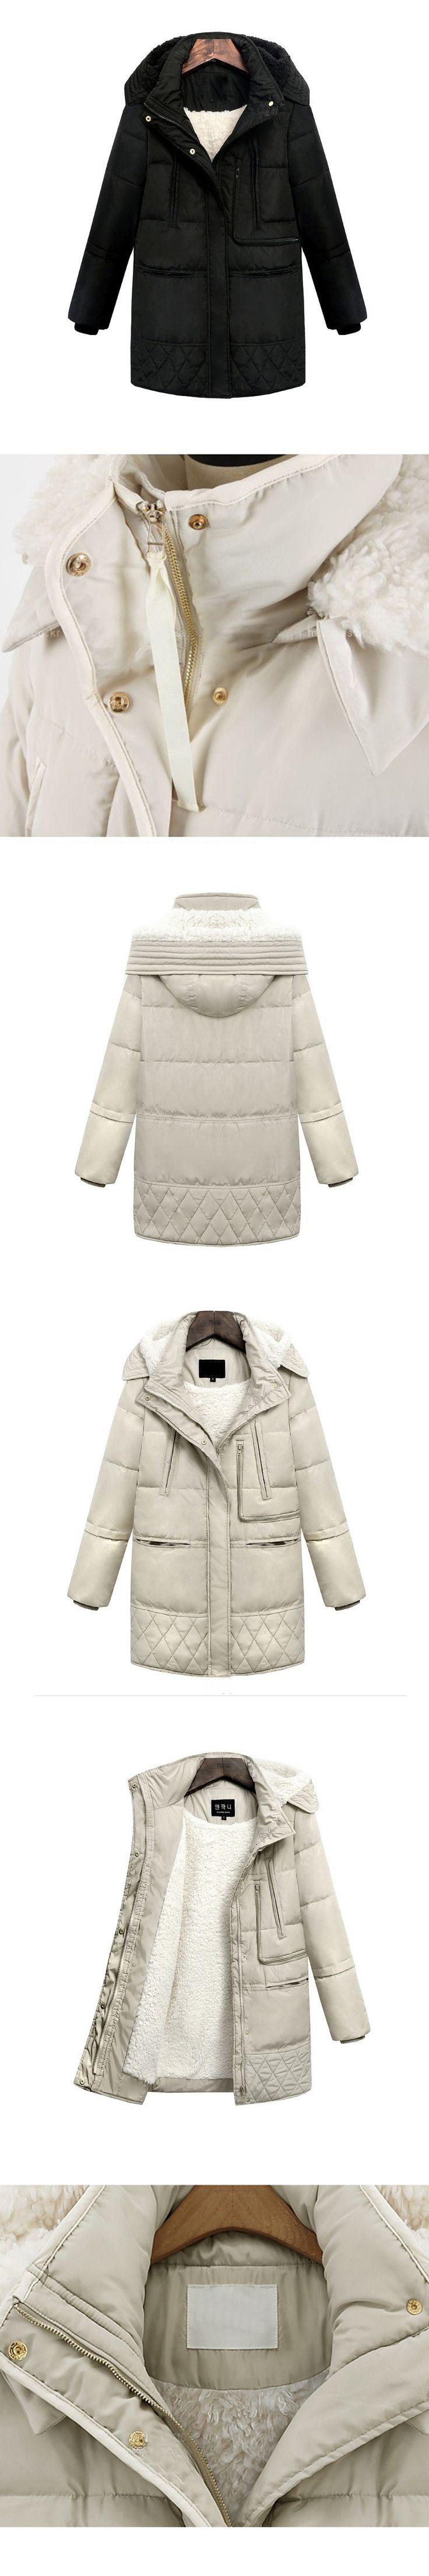 Hot Sale Autumn And Winter Womens Long Duck Down Coats Jacket Wool Goose Light Feather Snow Coat Plus Size Parkas Windbreaker